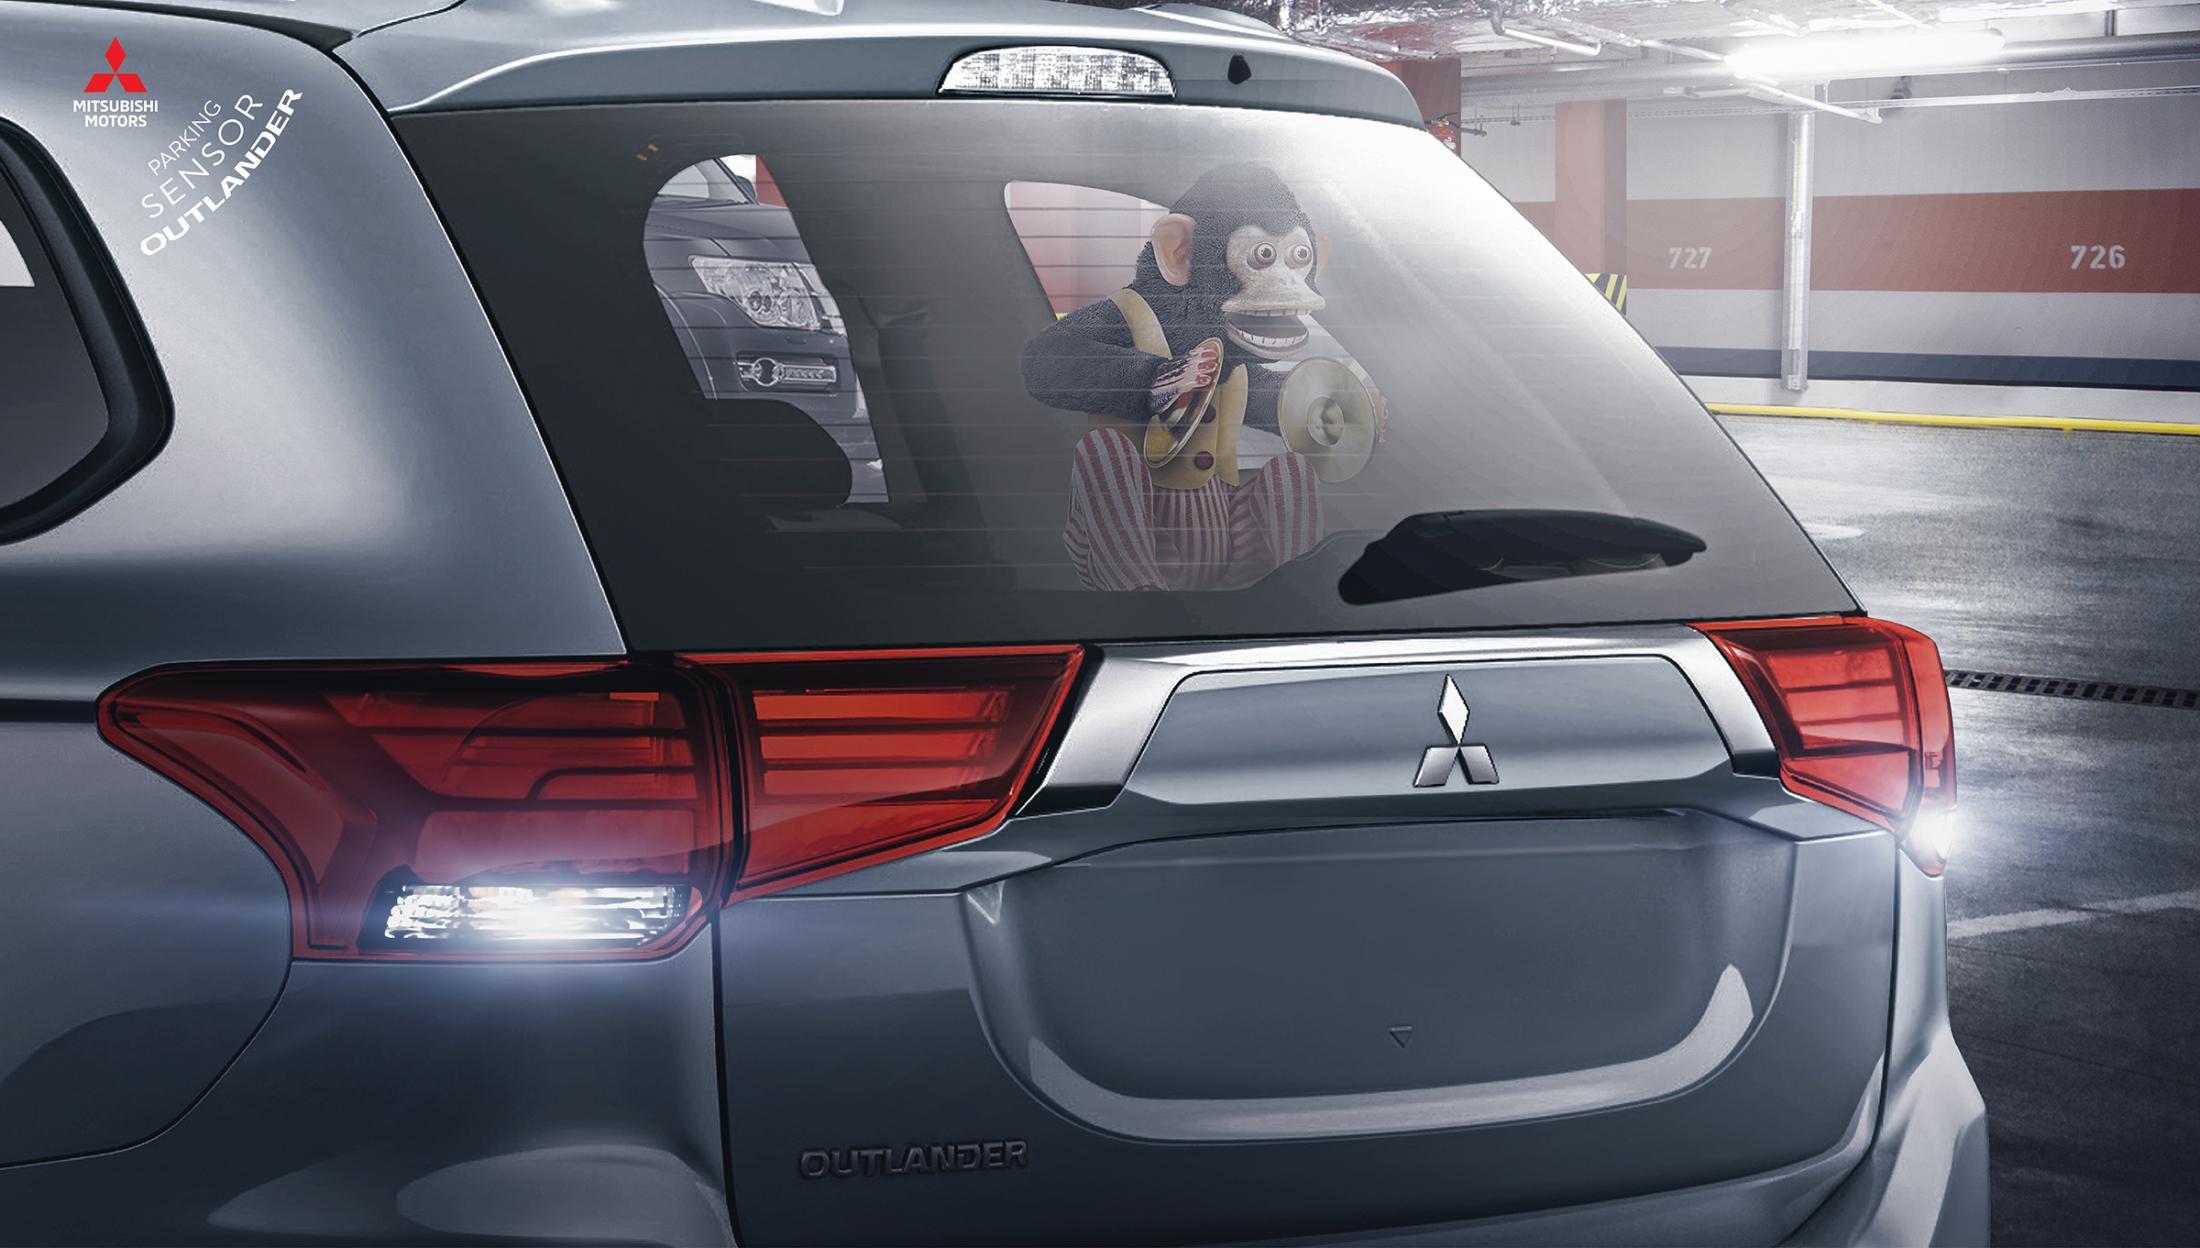 Mitsubishi Print Ad - Parking Sensor Outlander